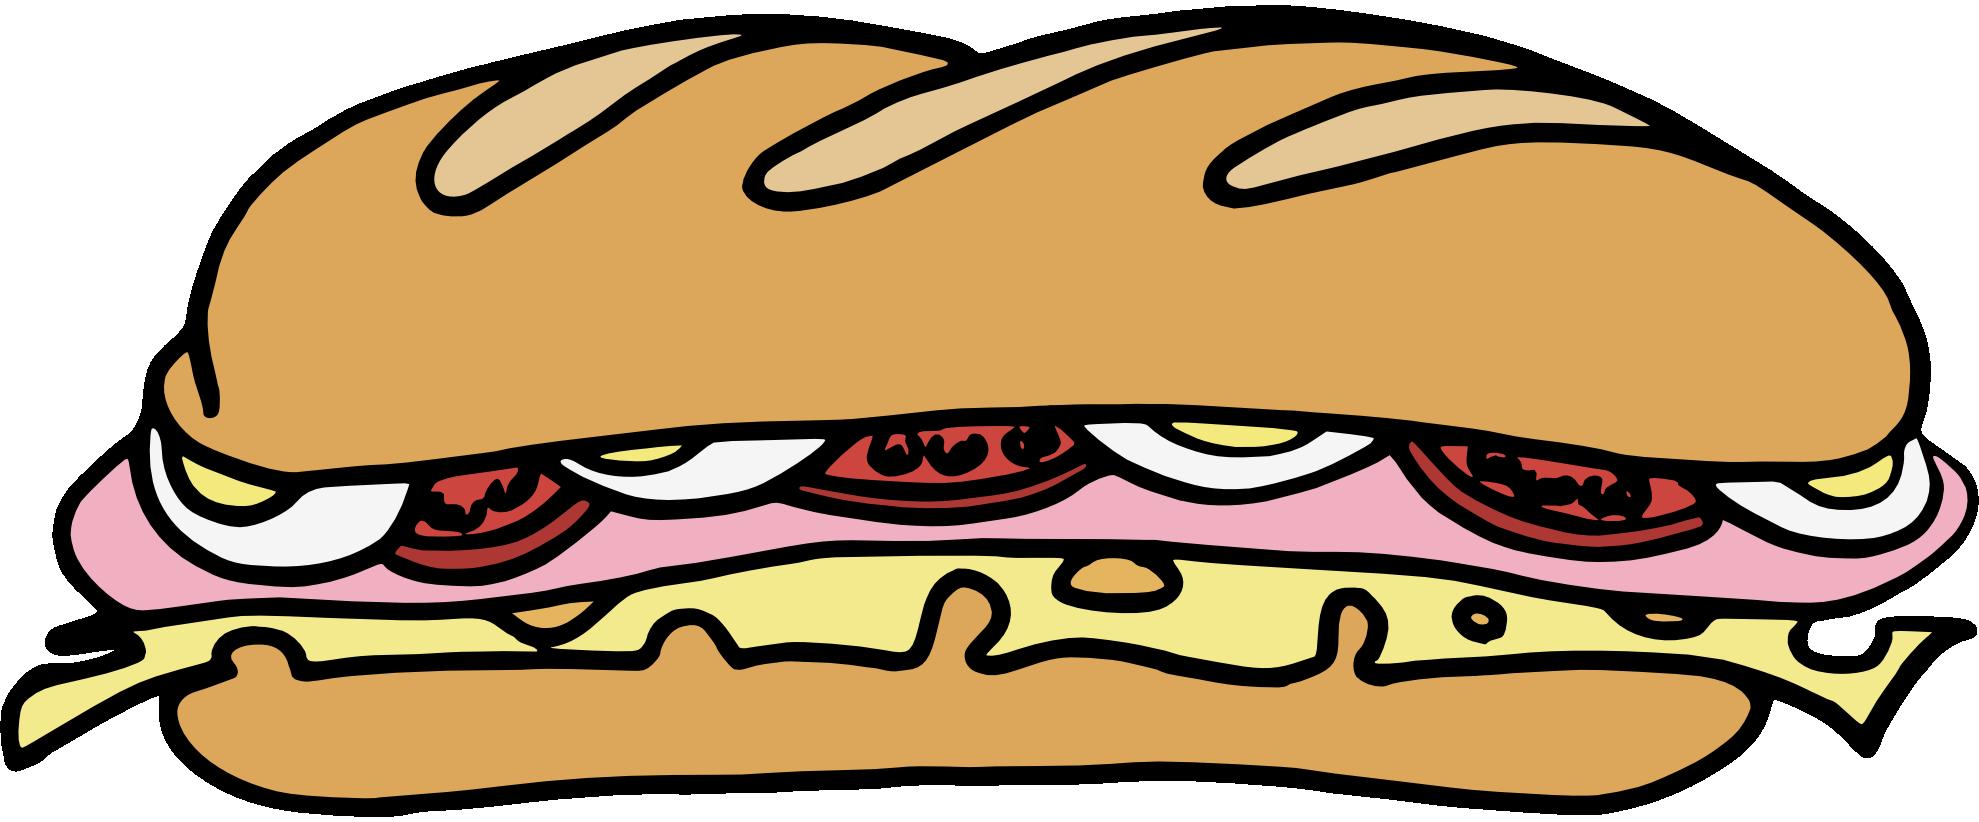 Submarine Sandwich. Sandwich Clip Art Fr-submarine sandwich. Sandwich clip art free clipart .-15